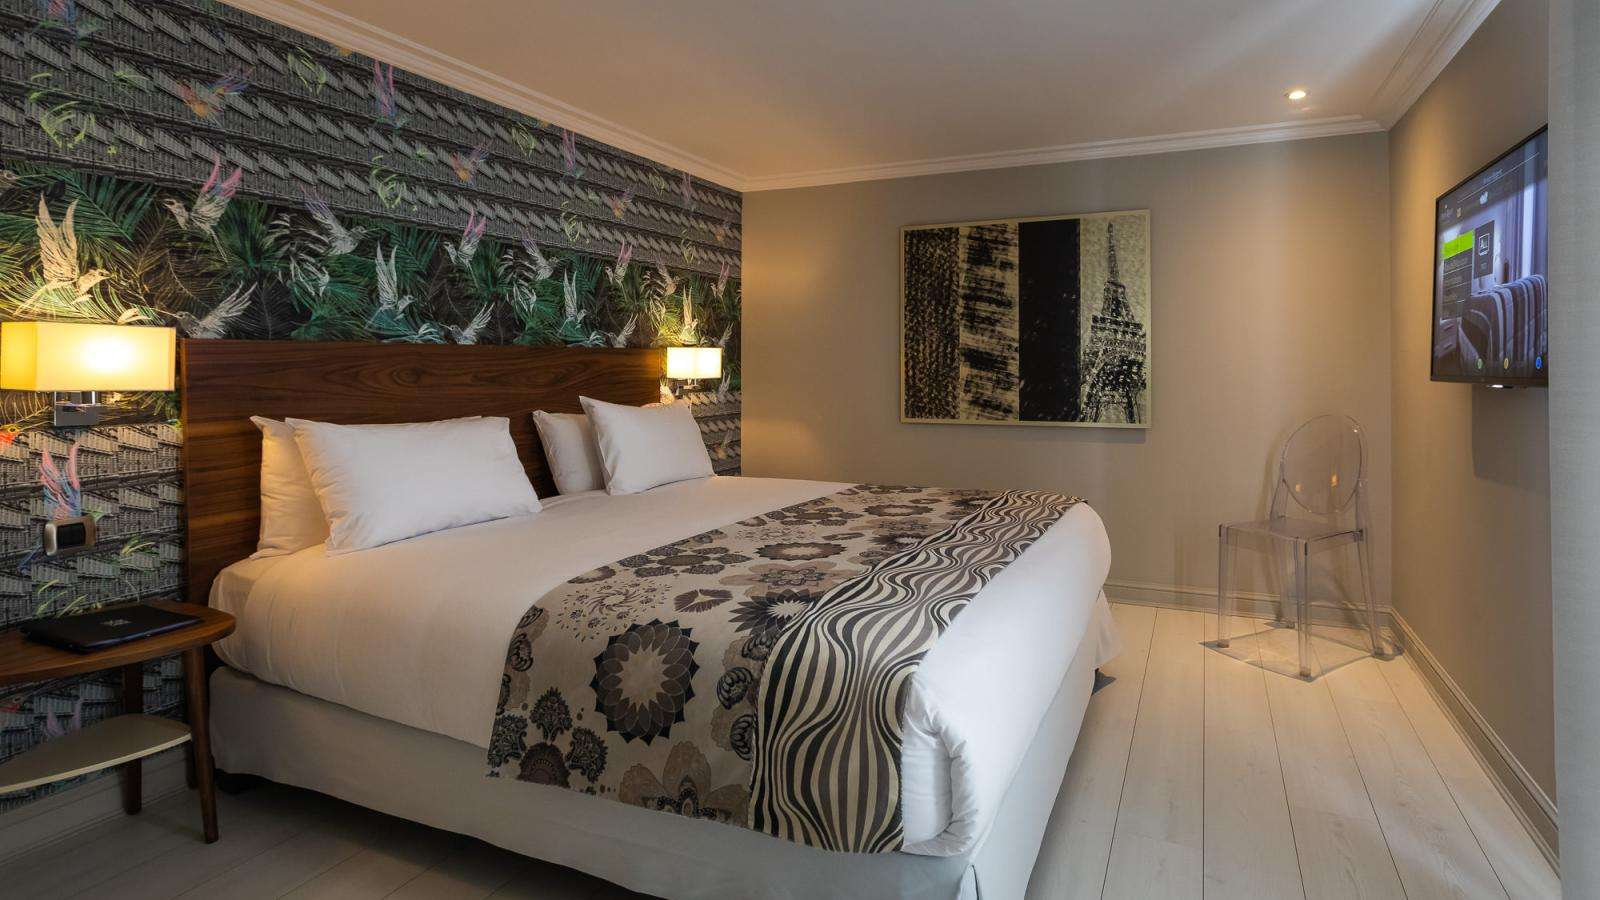 Hotel Prince Regent Residence  U0026 Spa - Official Site